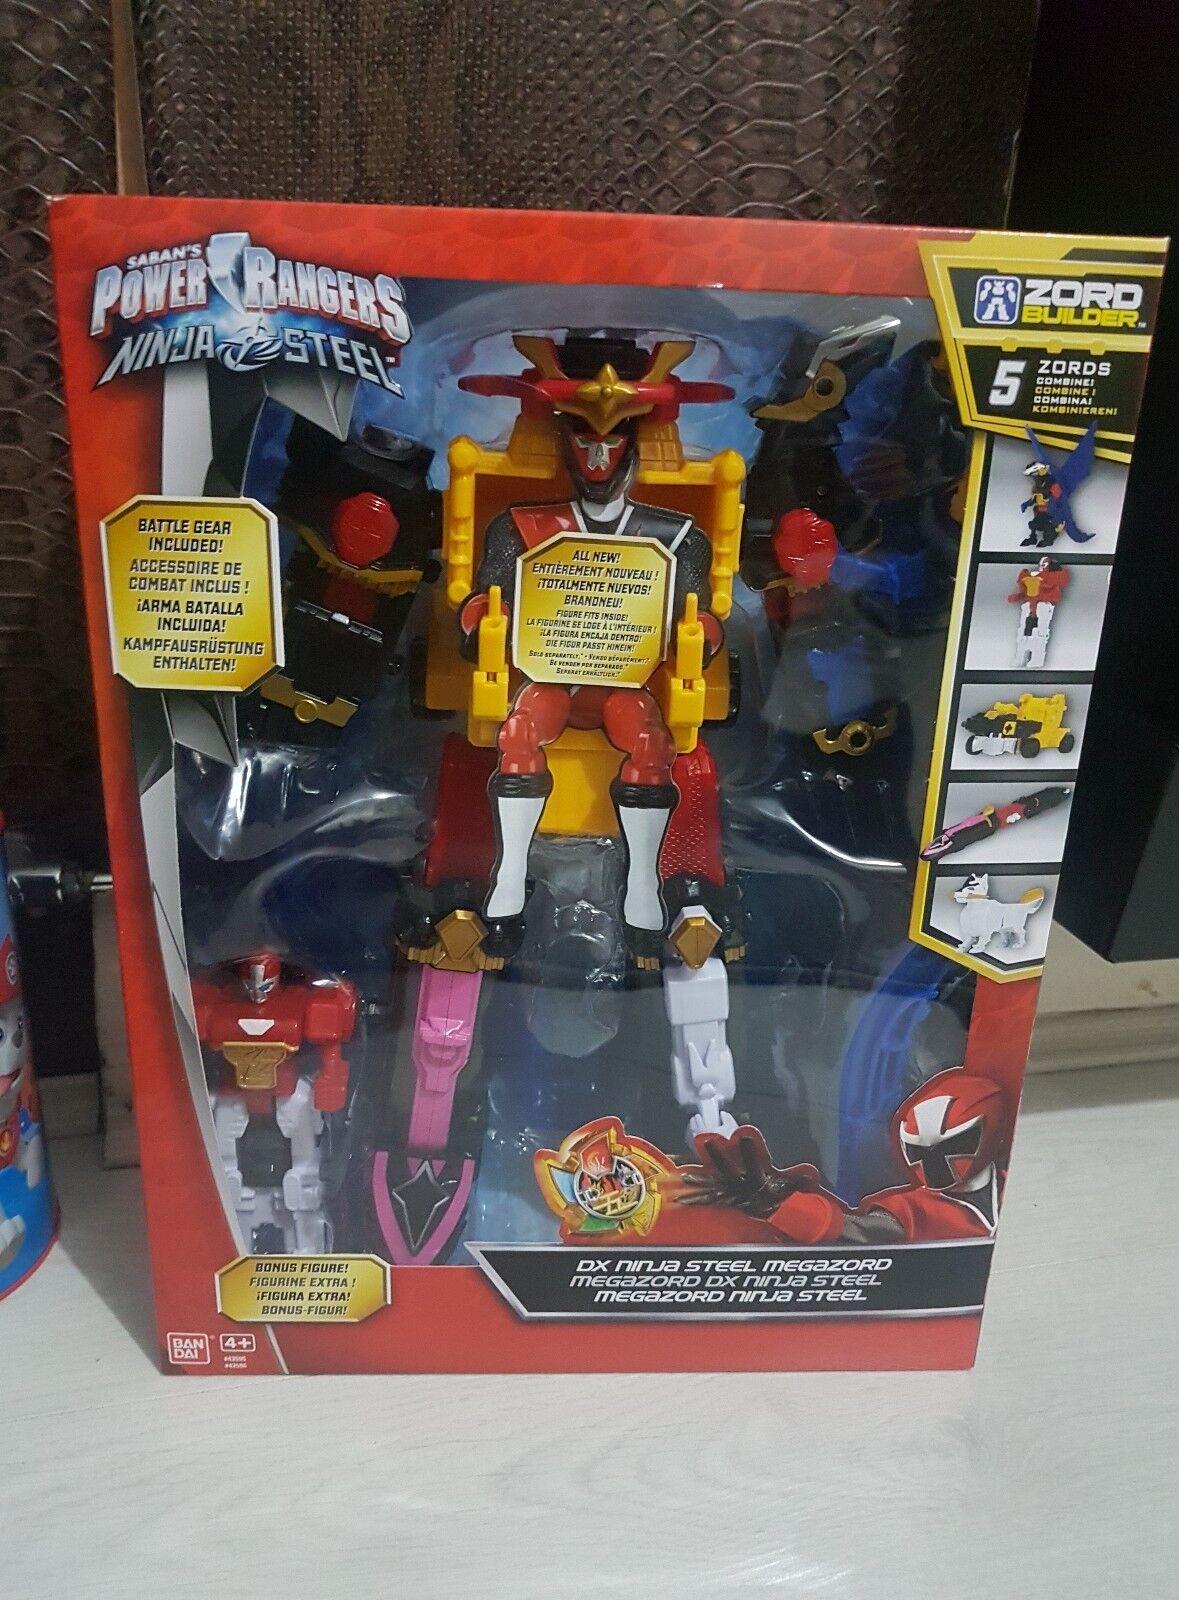 Power Rangers Ninja Steel - Deluxe Ninja Steel Megazord - Brand New